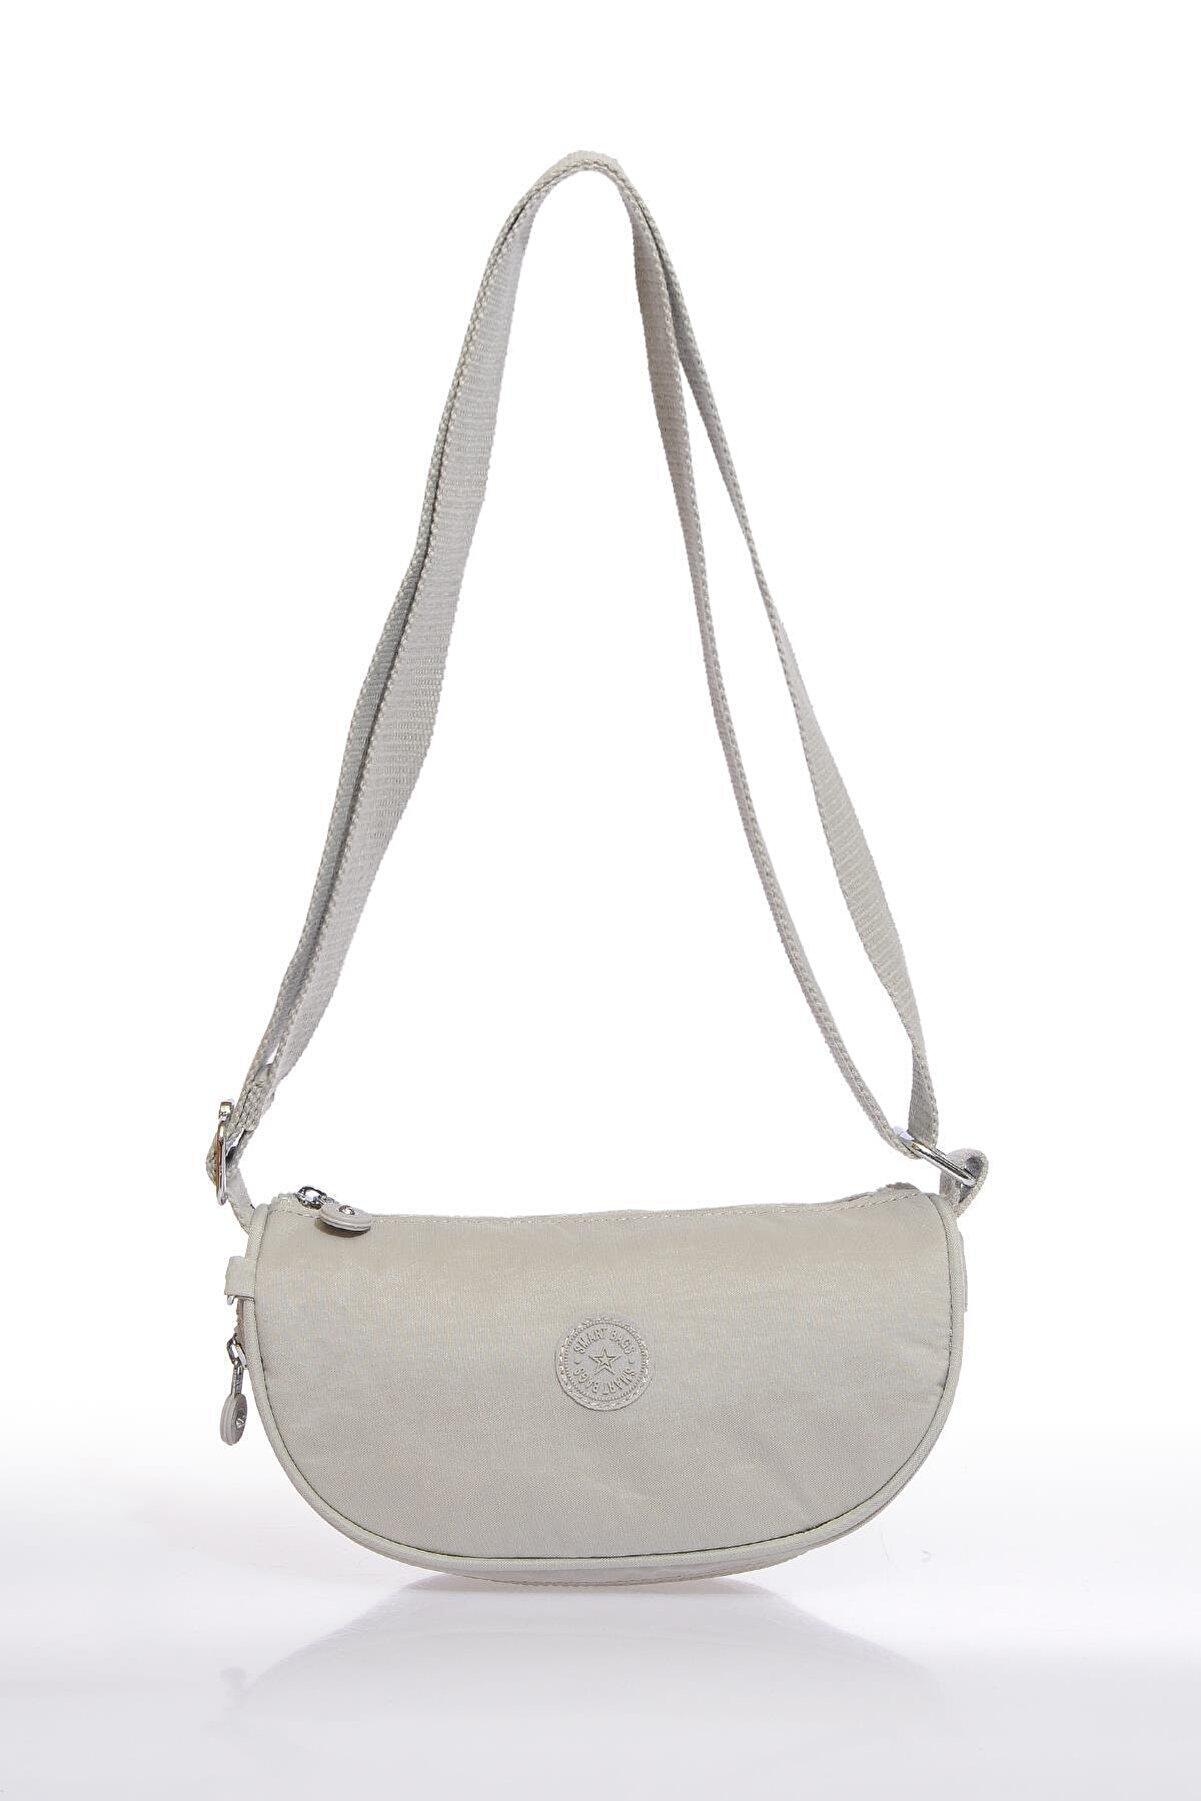 Smart Bags Smb3026-0083 Ice Gri Kadın Çapraz Çanta